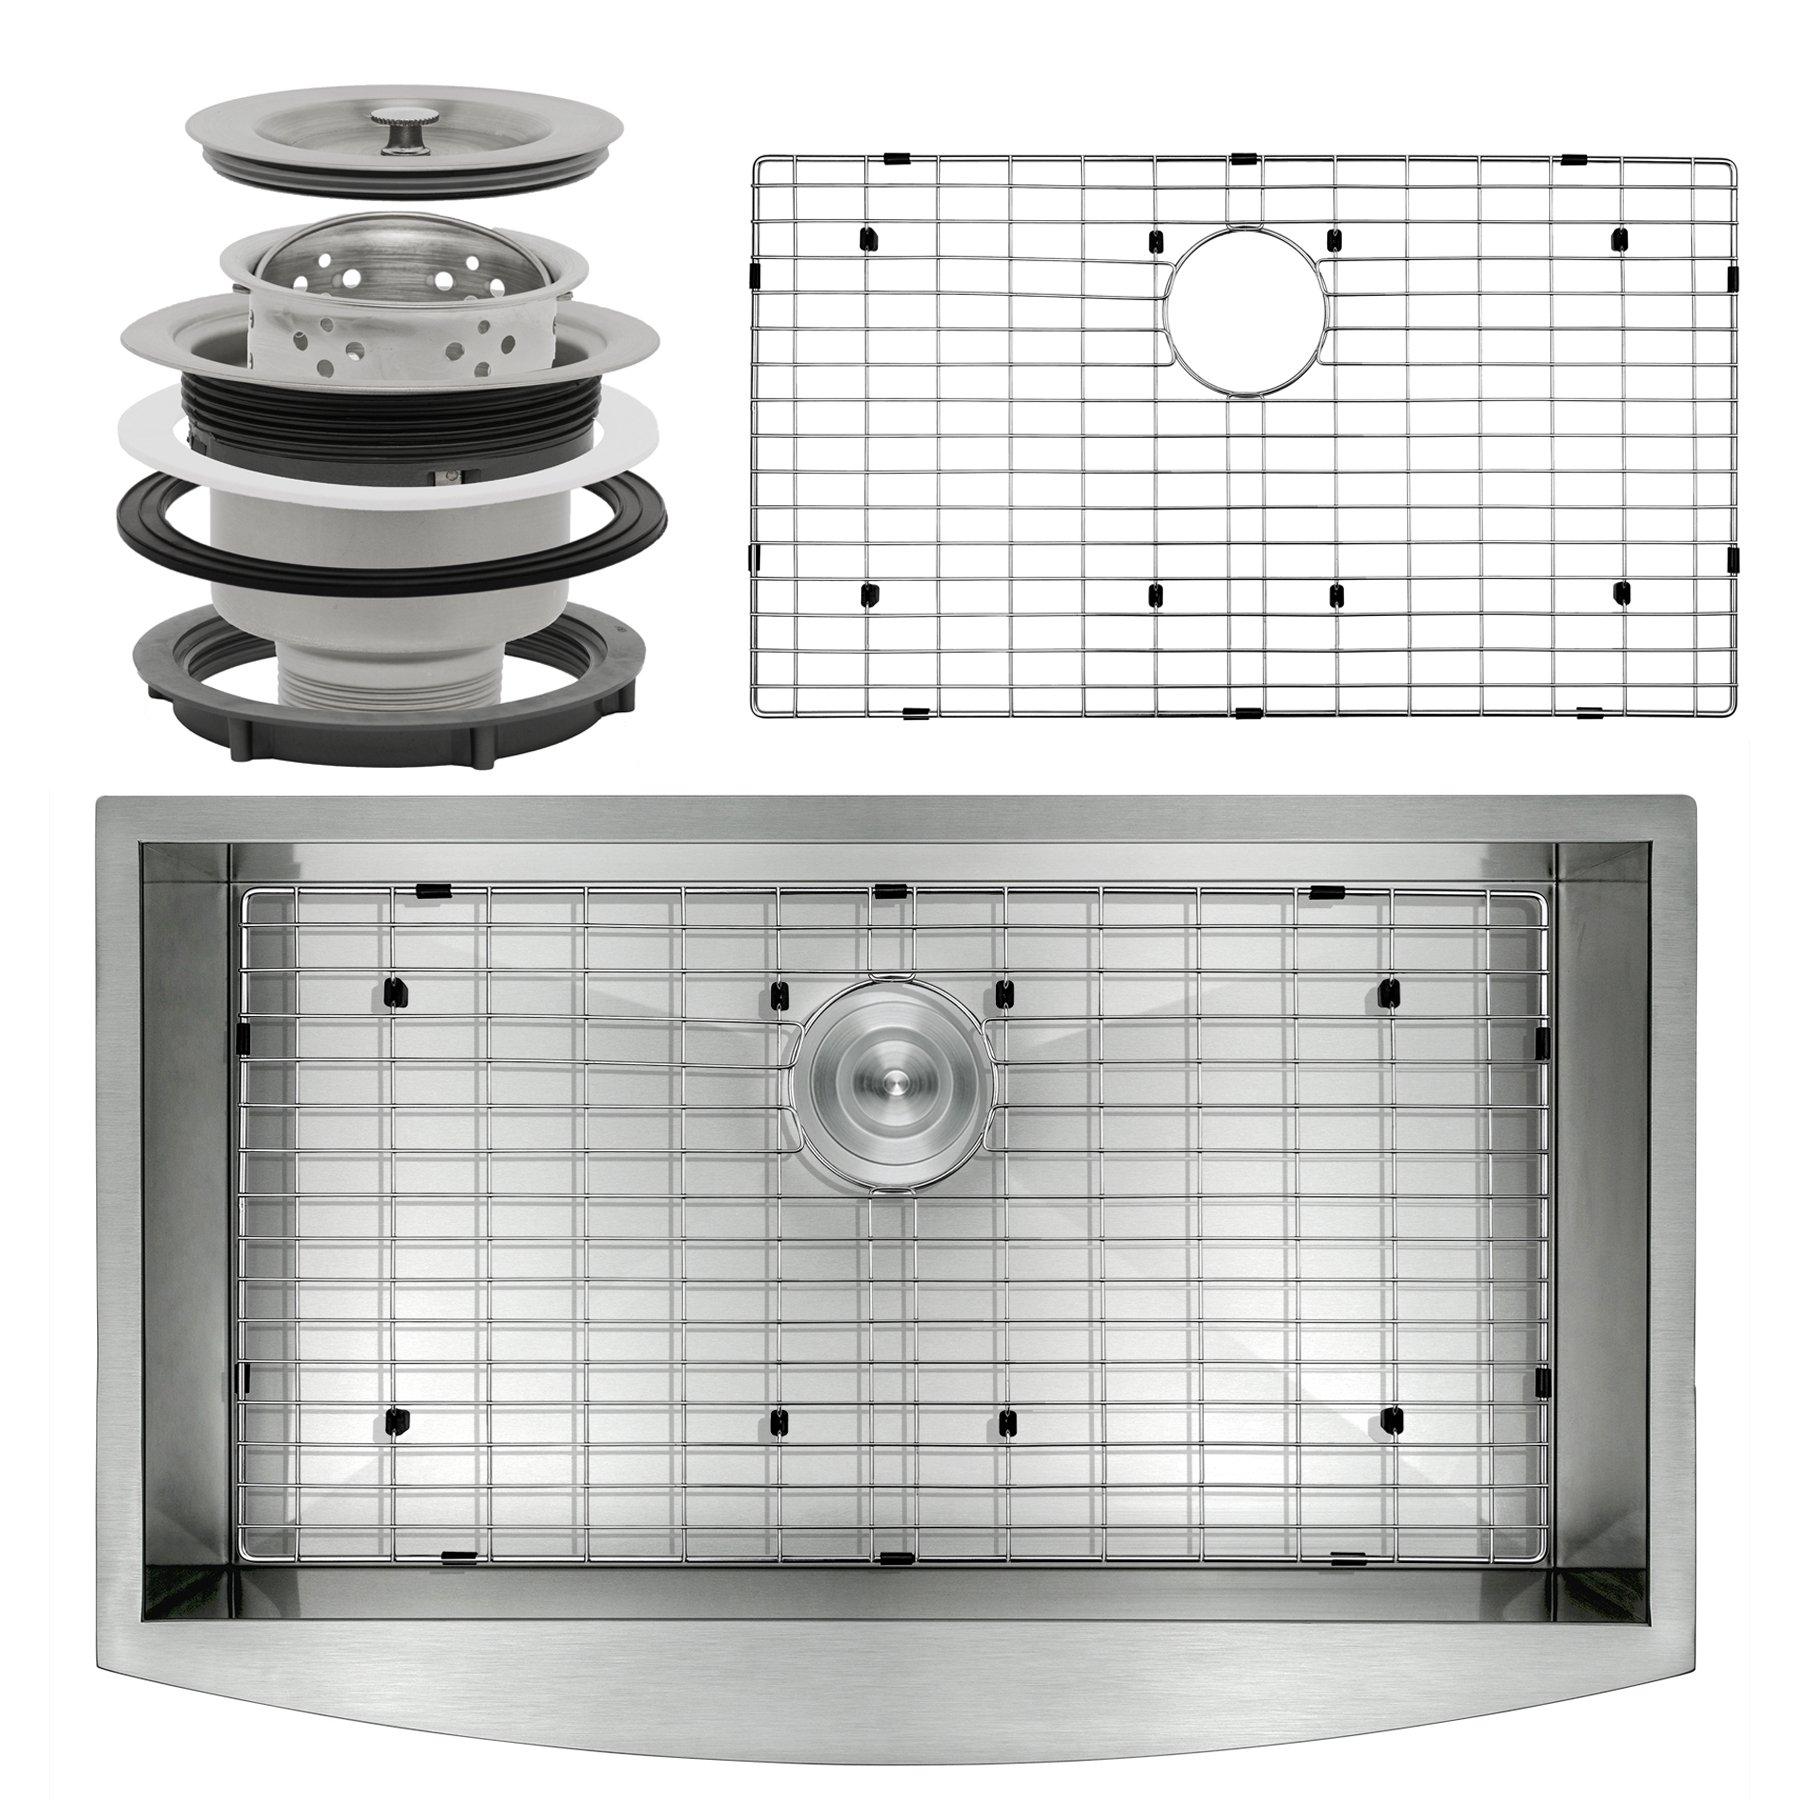 Perfetto Kitchen and Bath 33'' x 22'' x 9'' Apron Undermount Handmade 18 Gauge Stainless Steel Single Basin Kitchen Sink w/ Dish Grid & Drain Combo